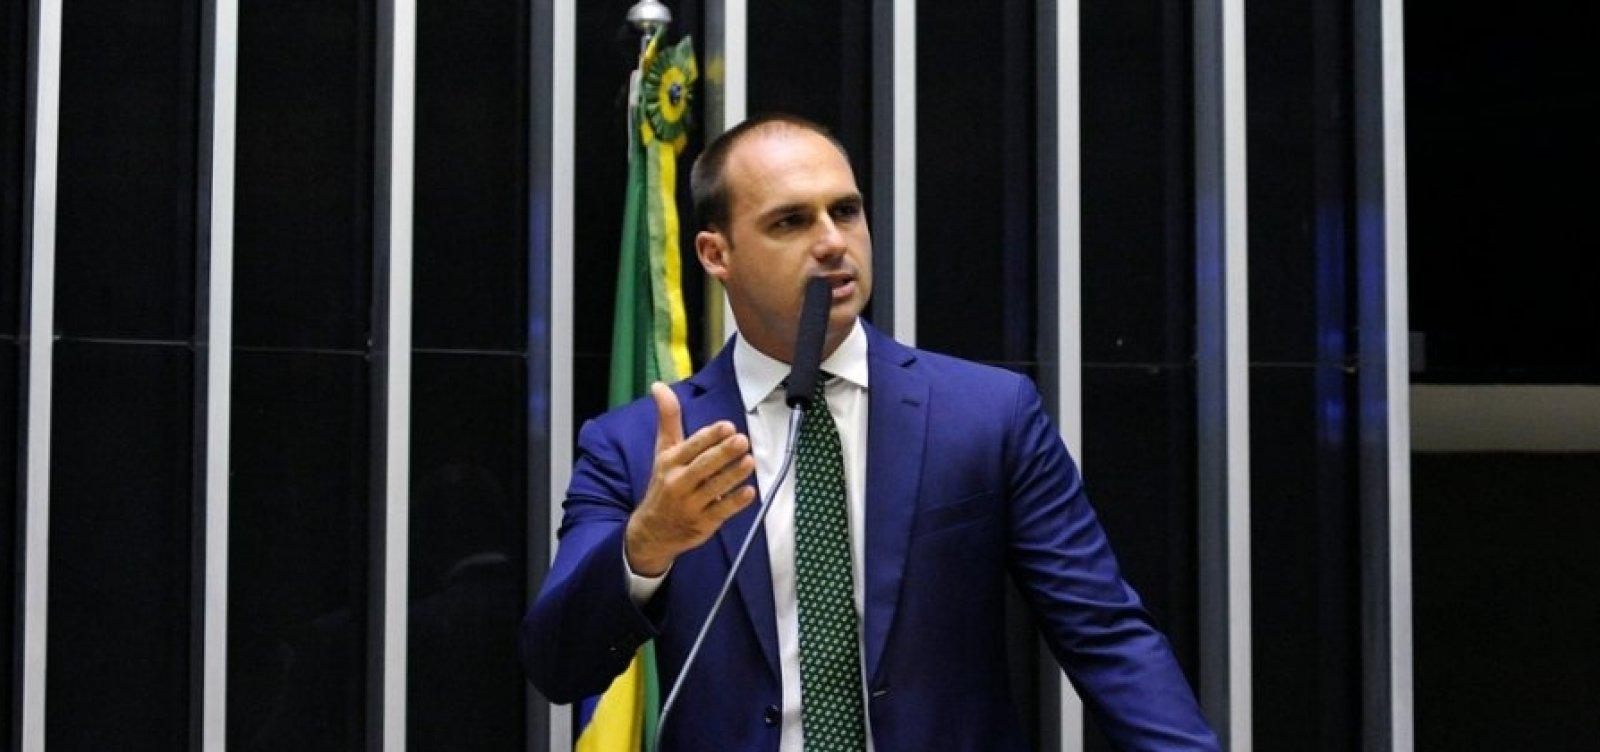 Supremo tenta intimar filho de Bolsonaro, mas não consegue localizá-lo